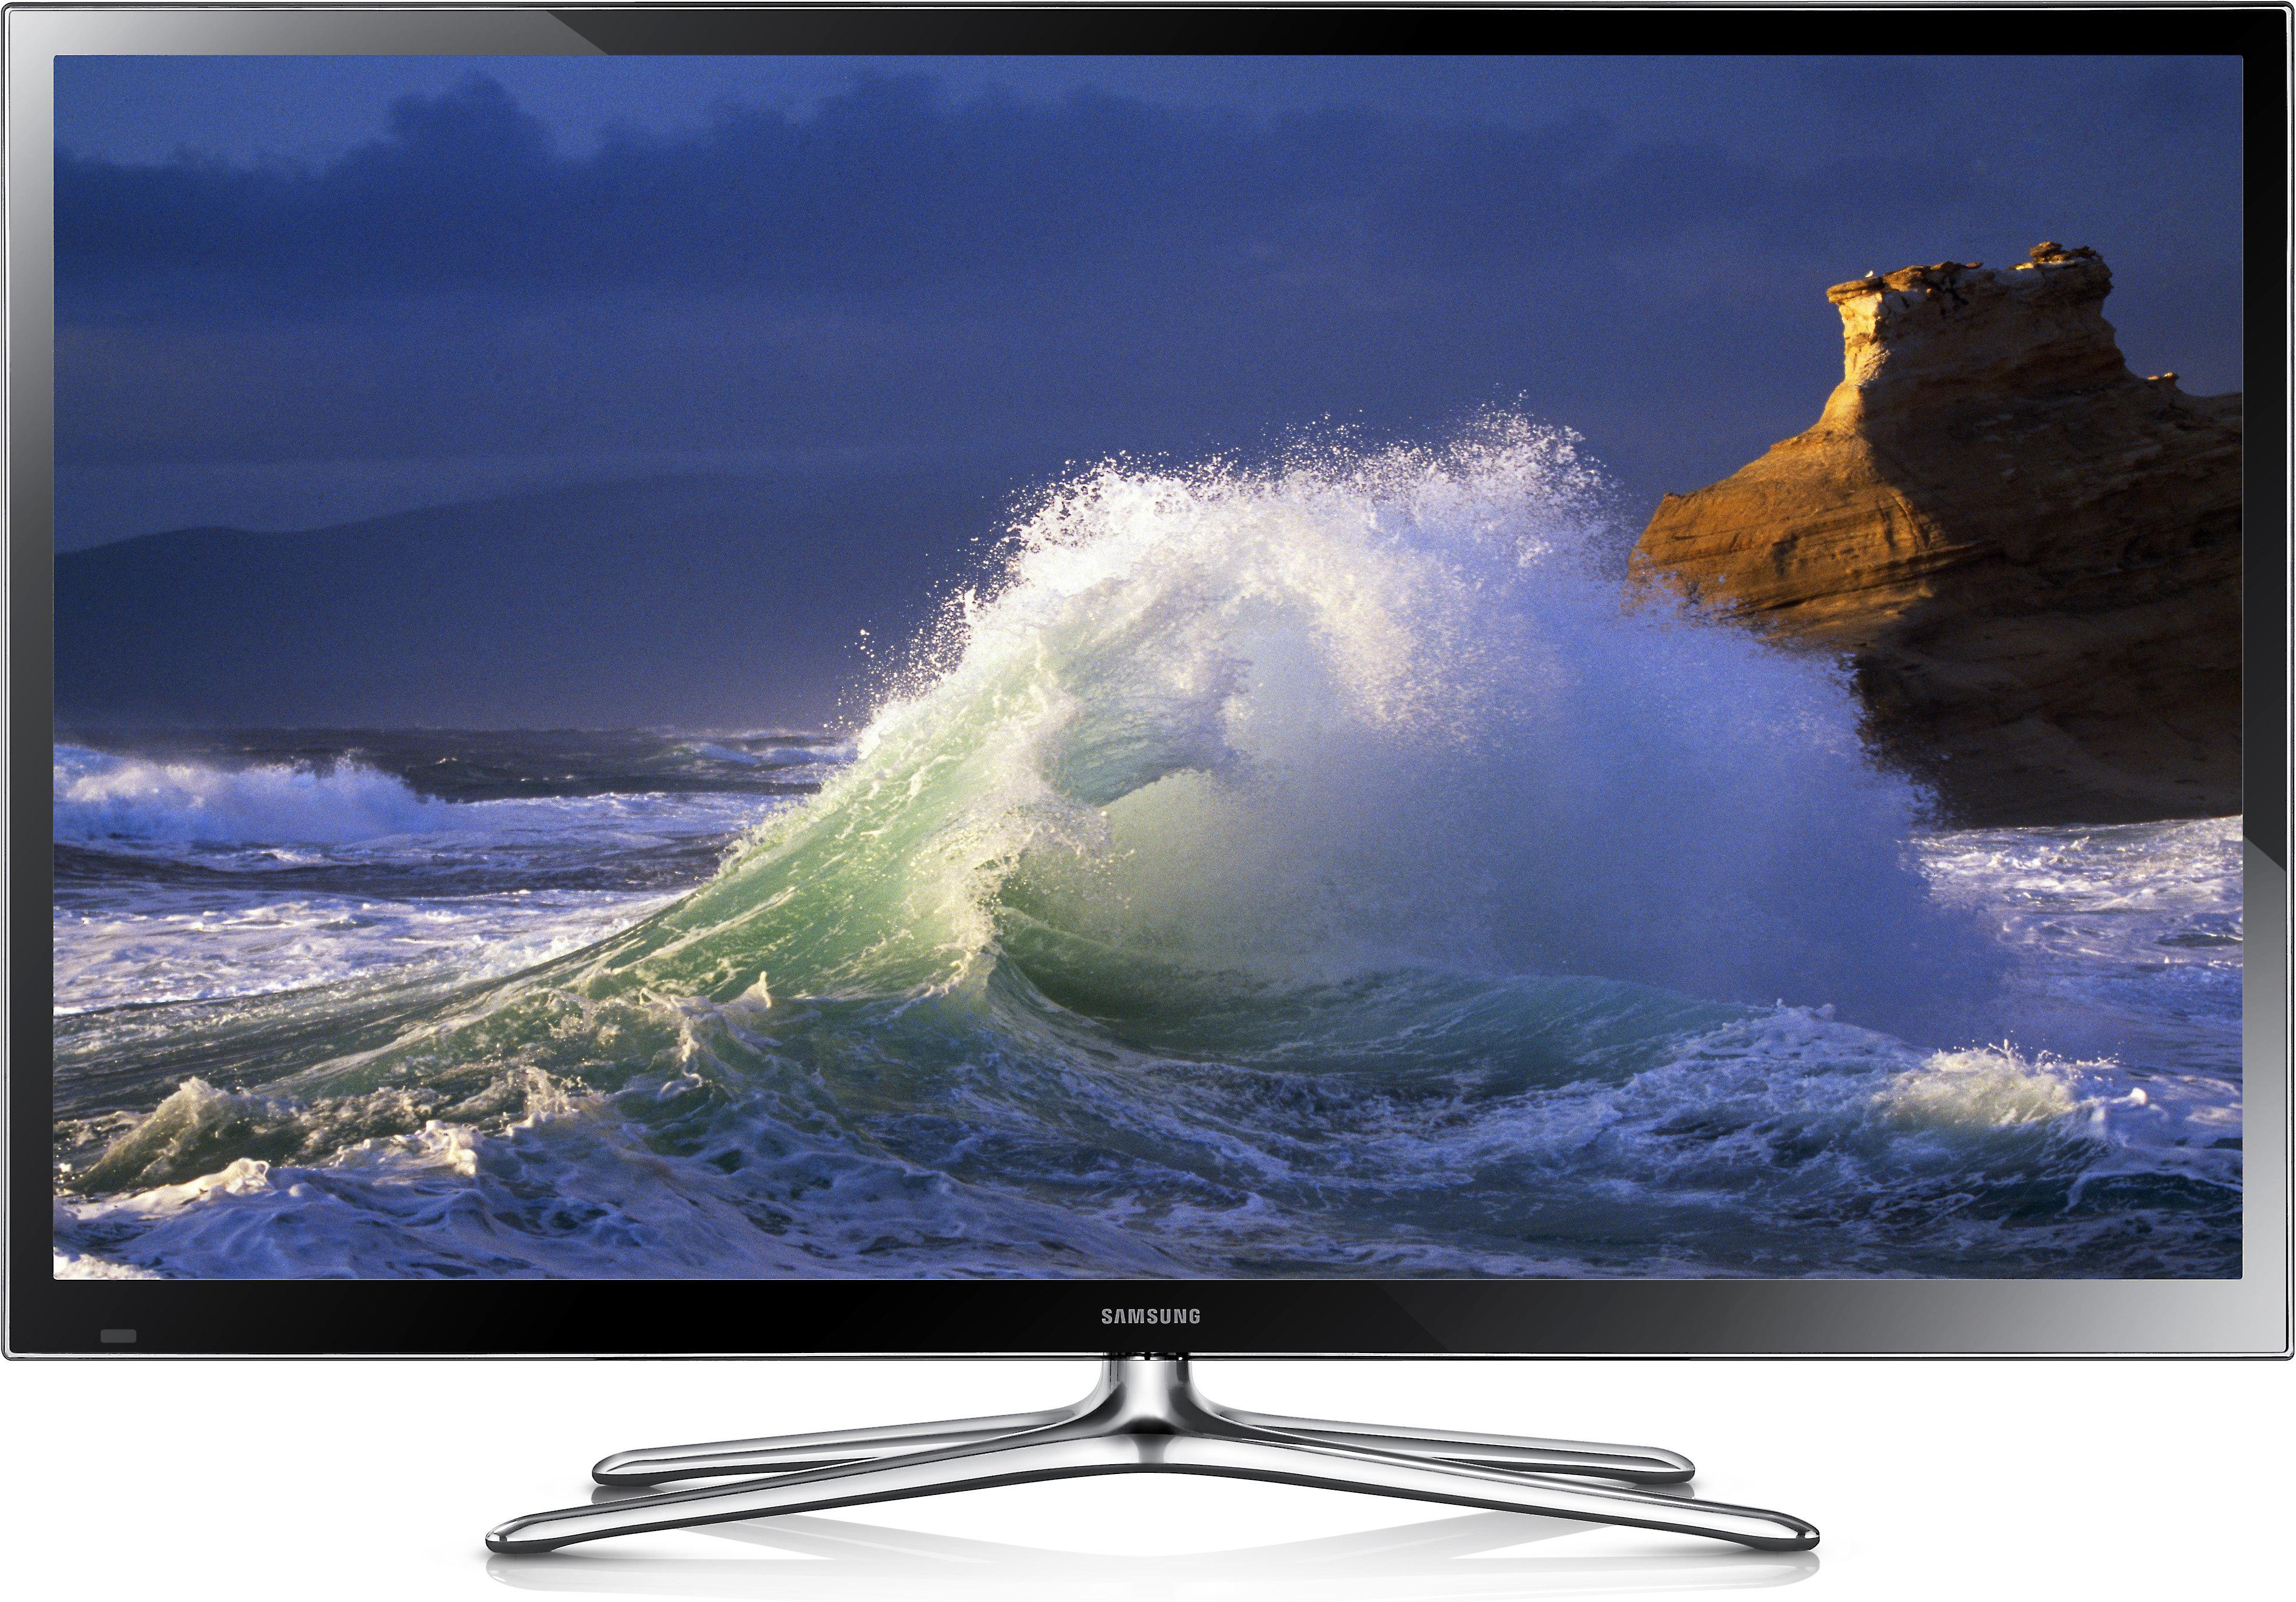 Samsung PN51F5500